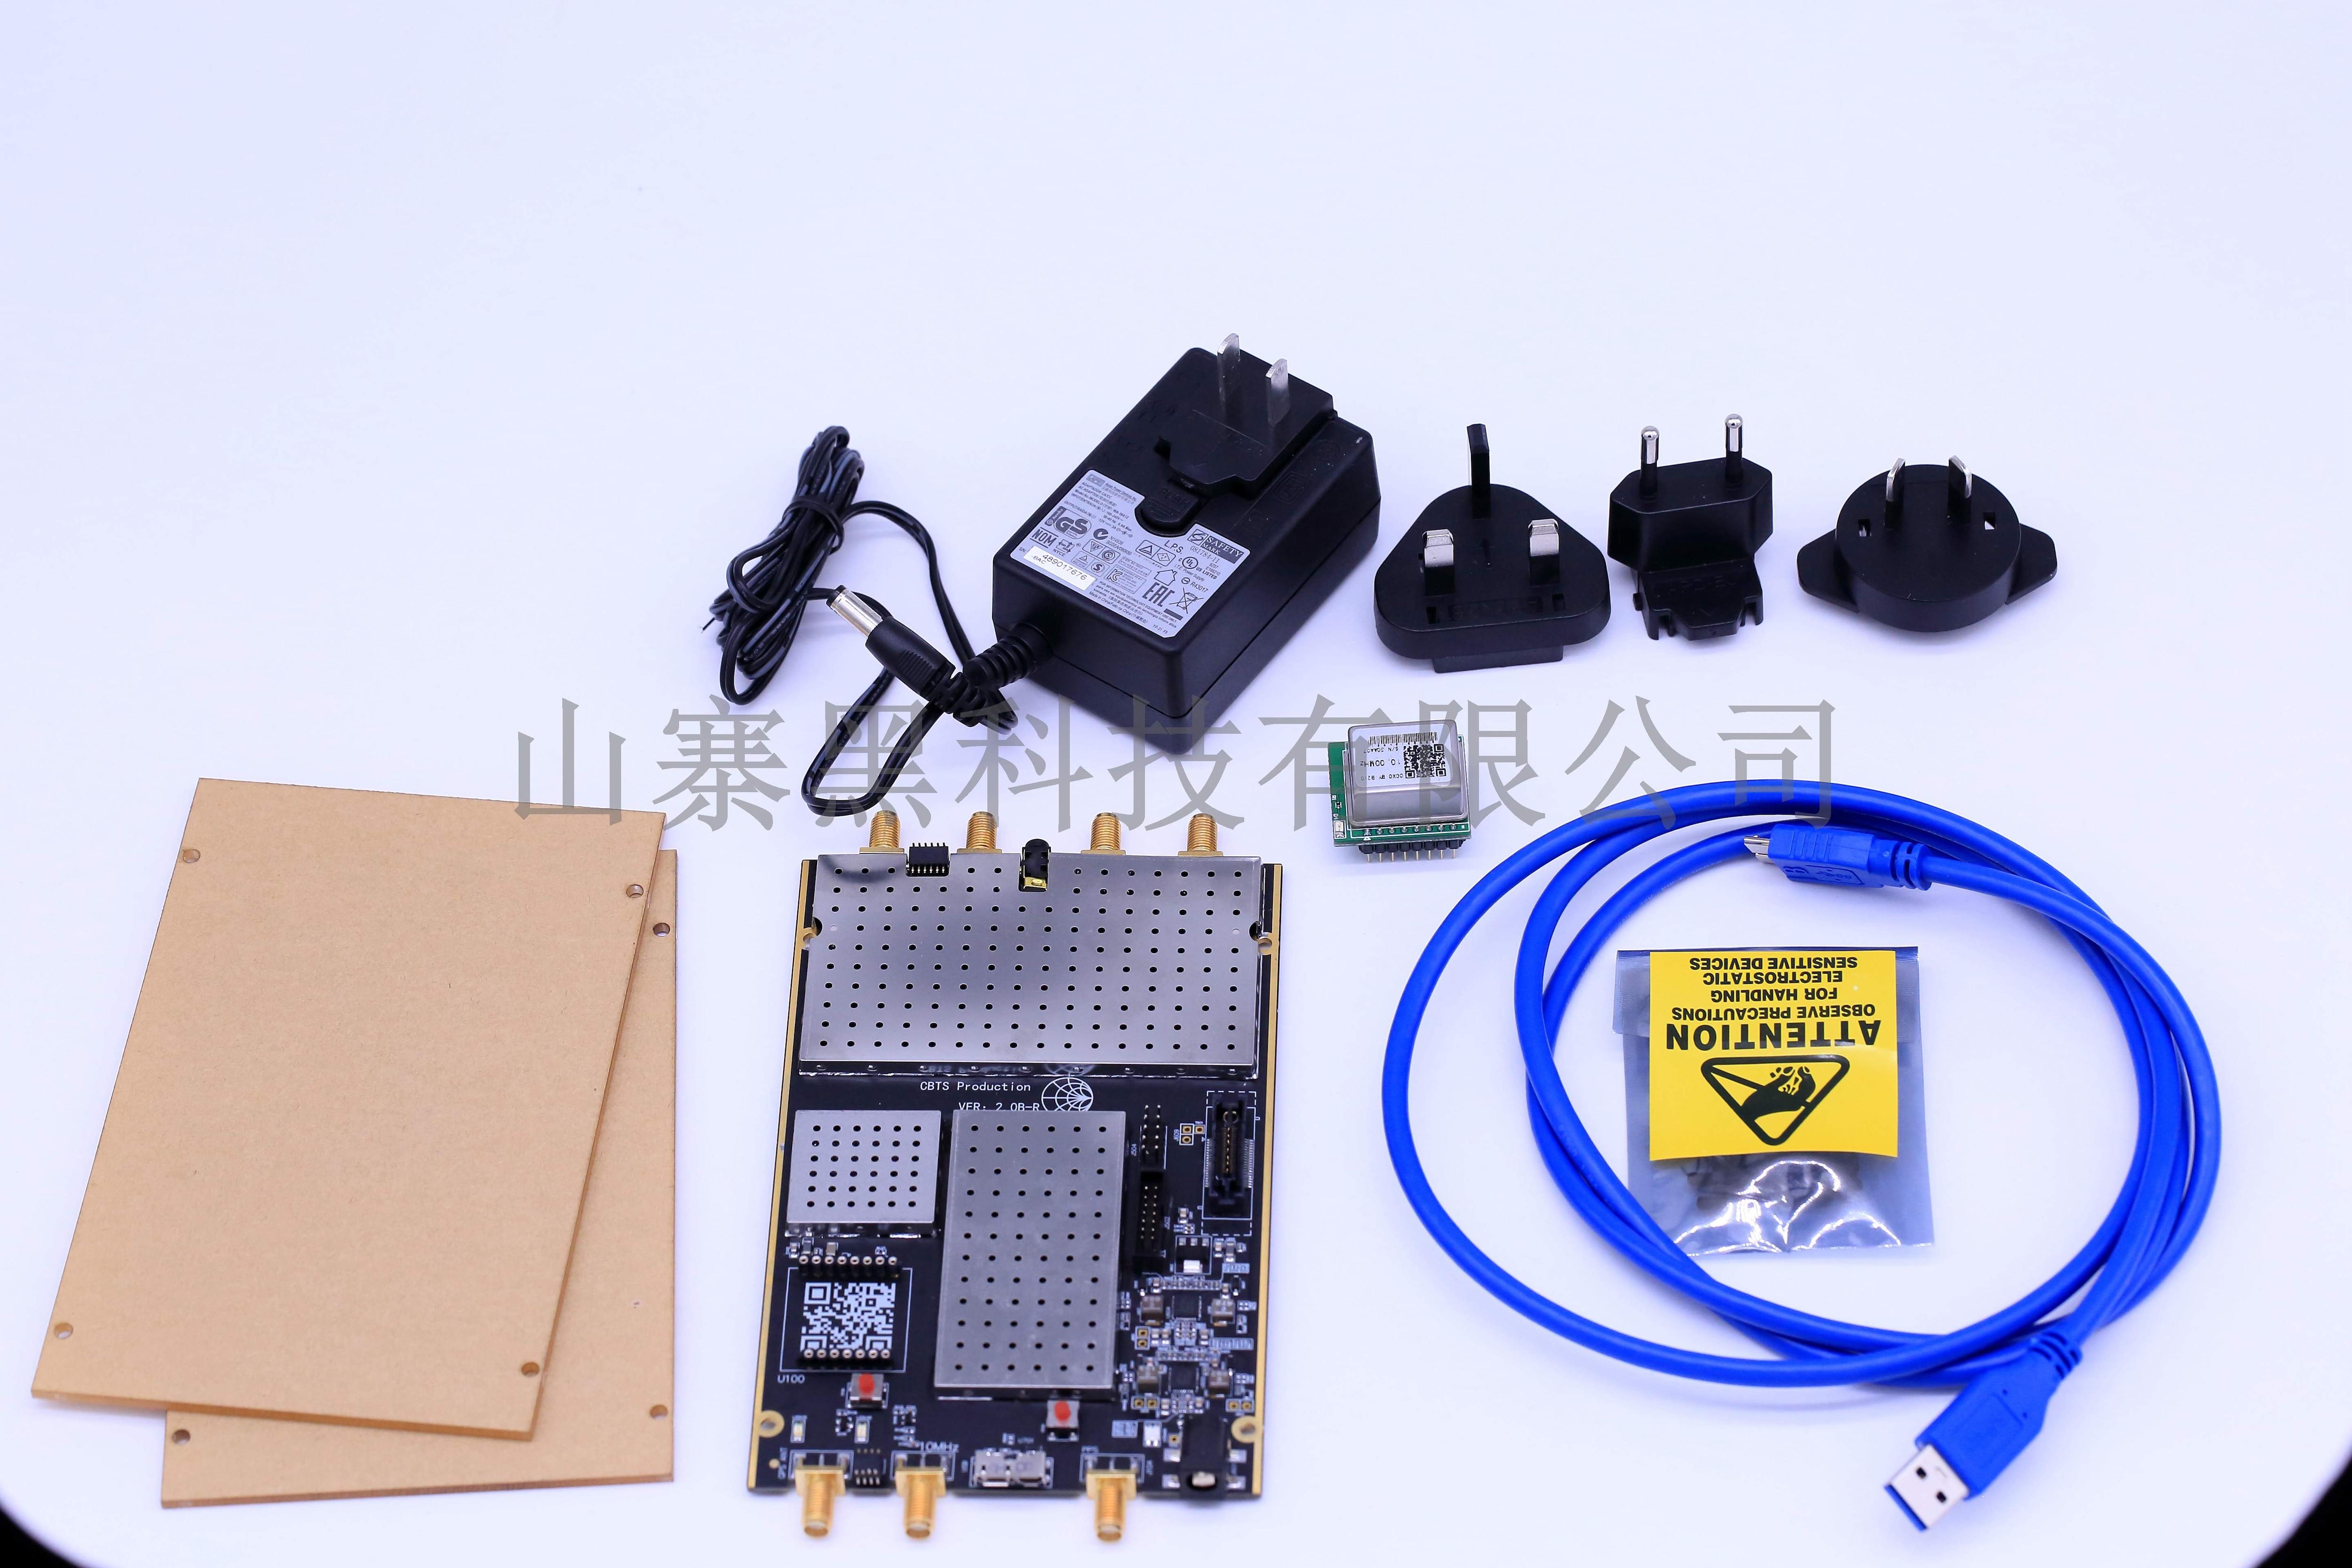 AD9361 70MHz - 6GHz البرمجيات SDR تعريف راديو USB3.0 متوافق مع USRP B210 + 10MHz GPSDO GPS-DO